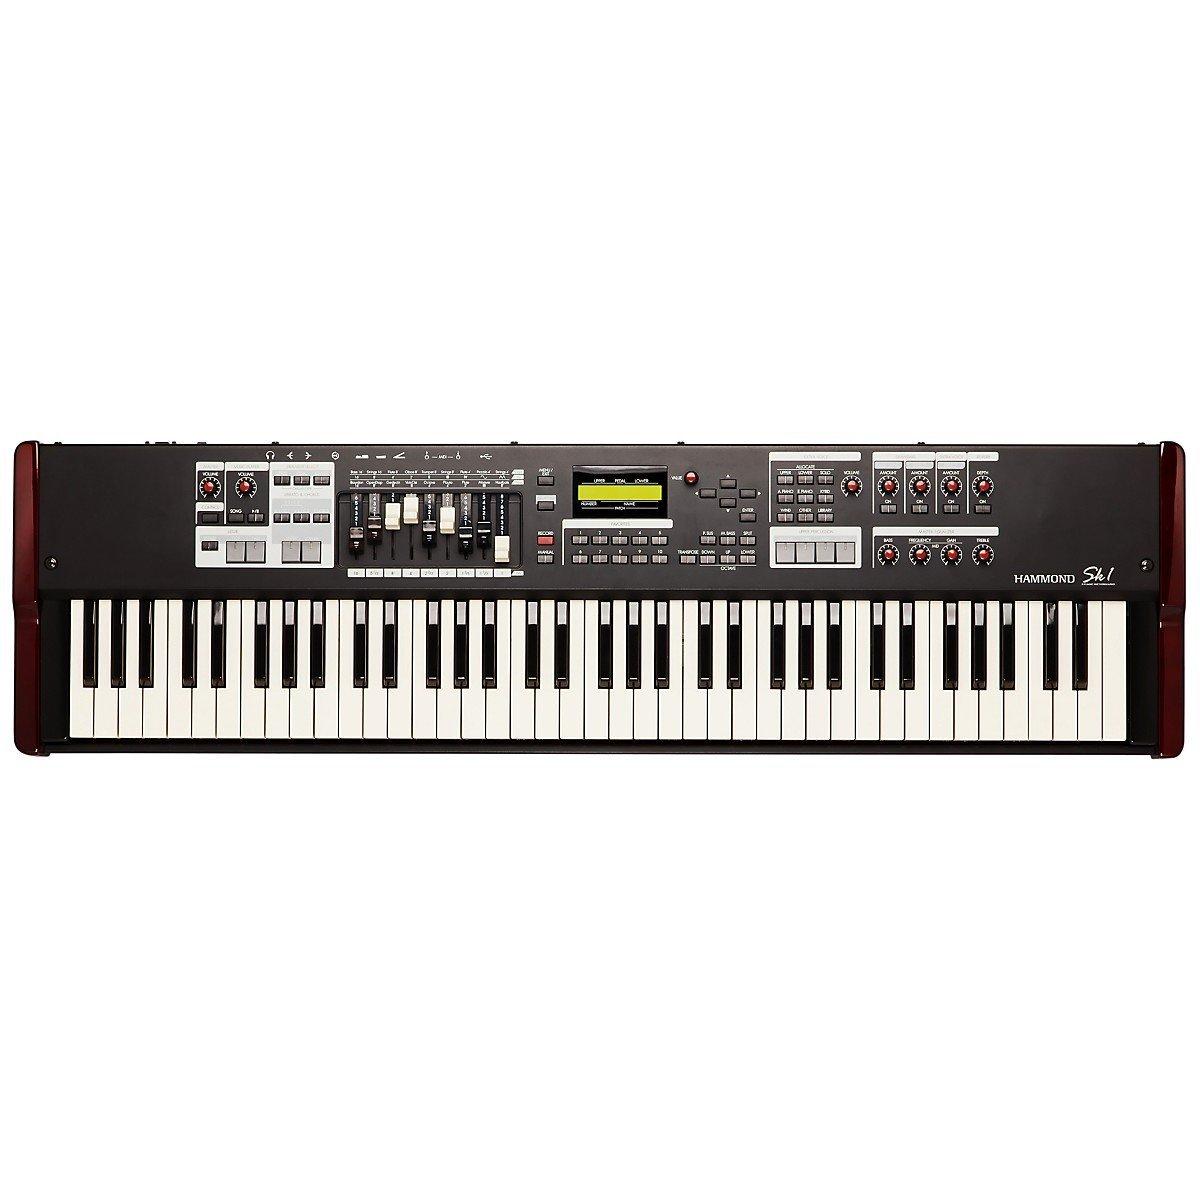 Hammond SK1-73 Ultralight 73-Note Portable Foundation Keyboard